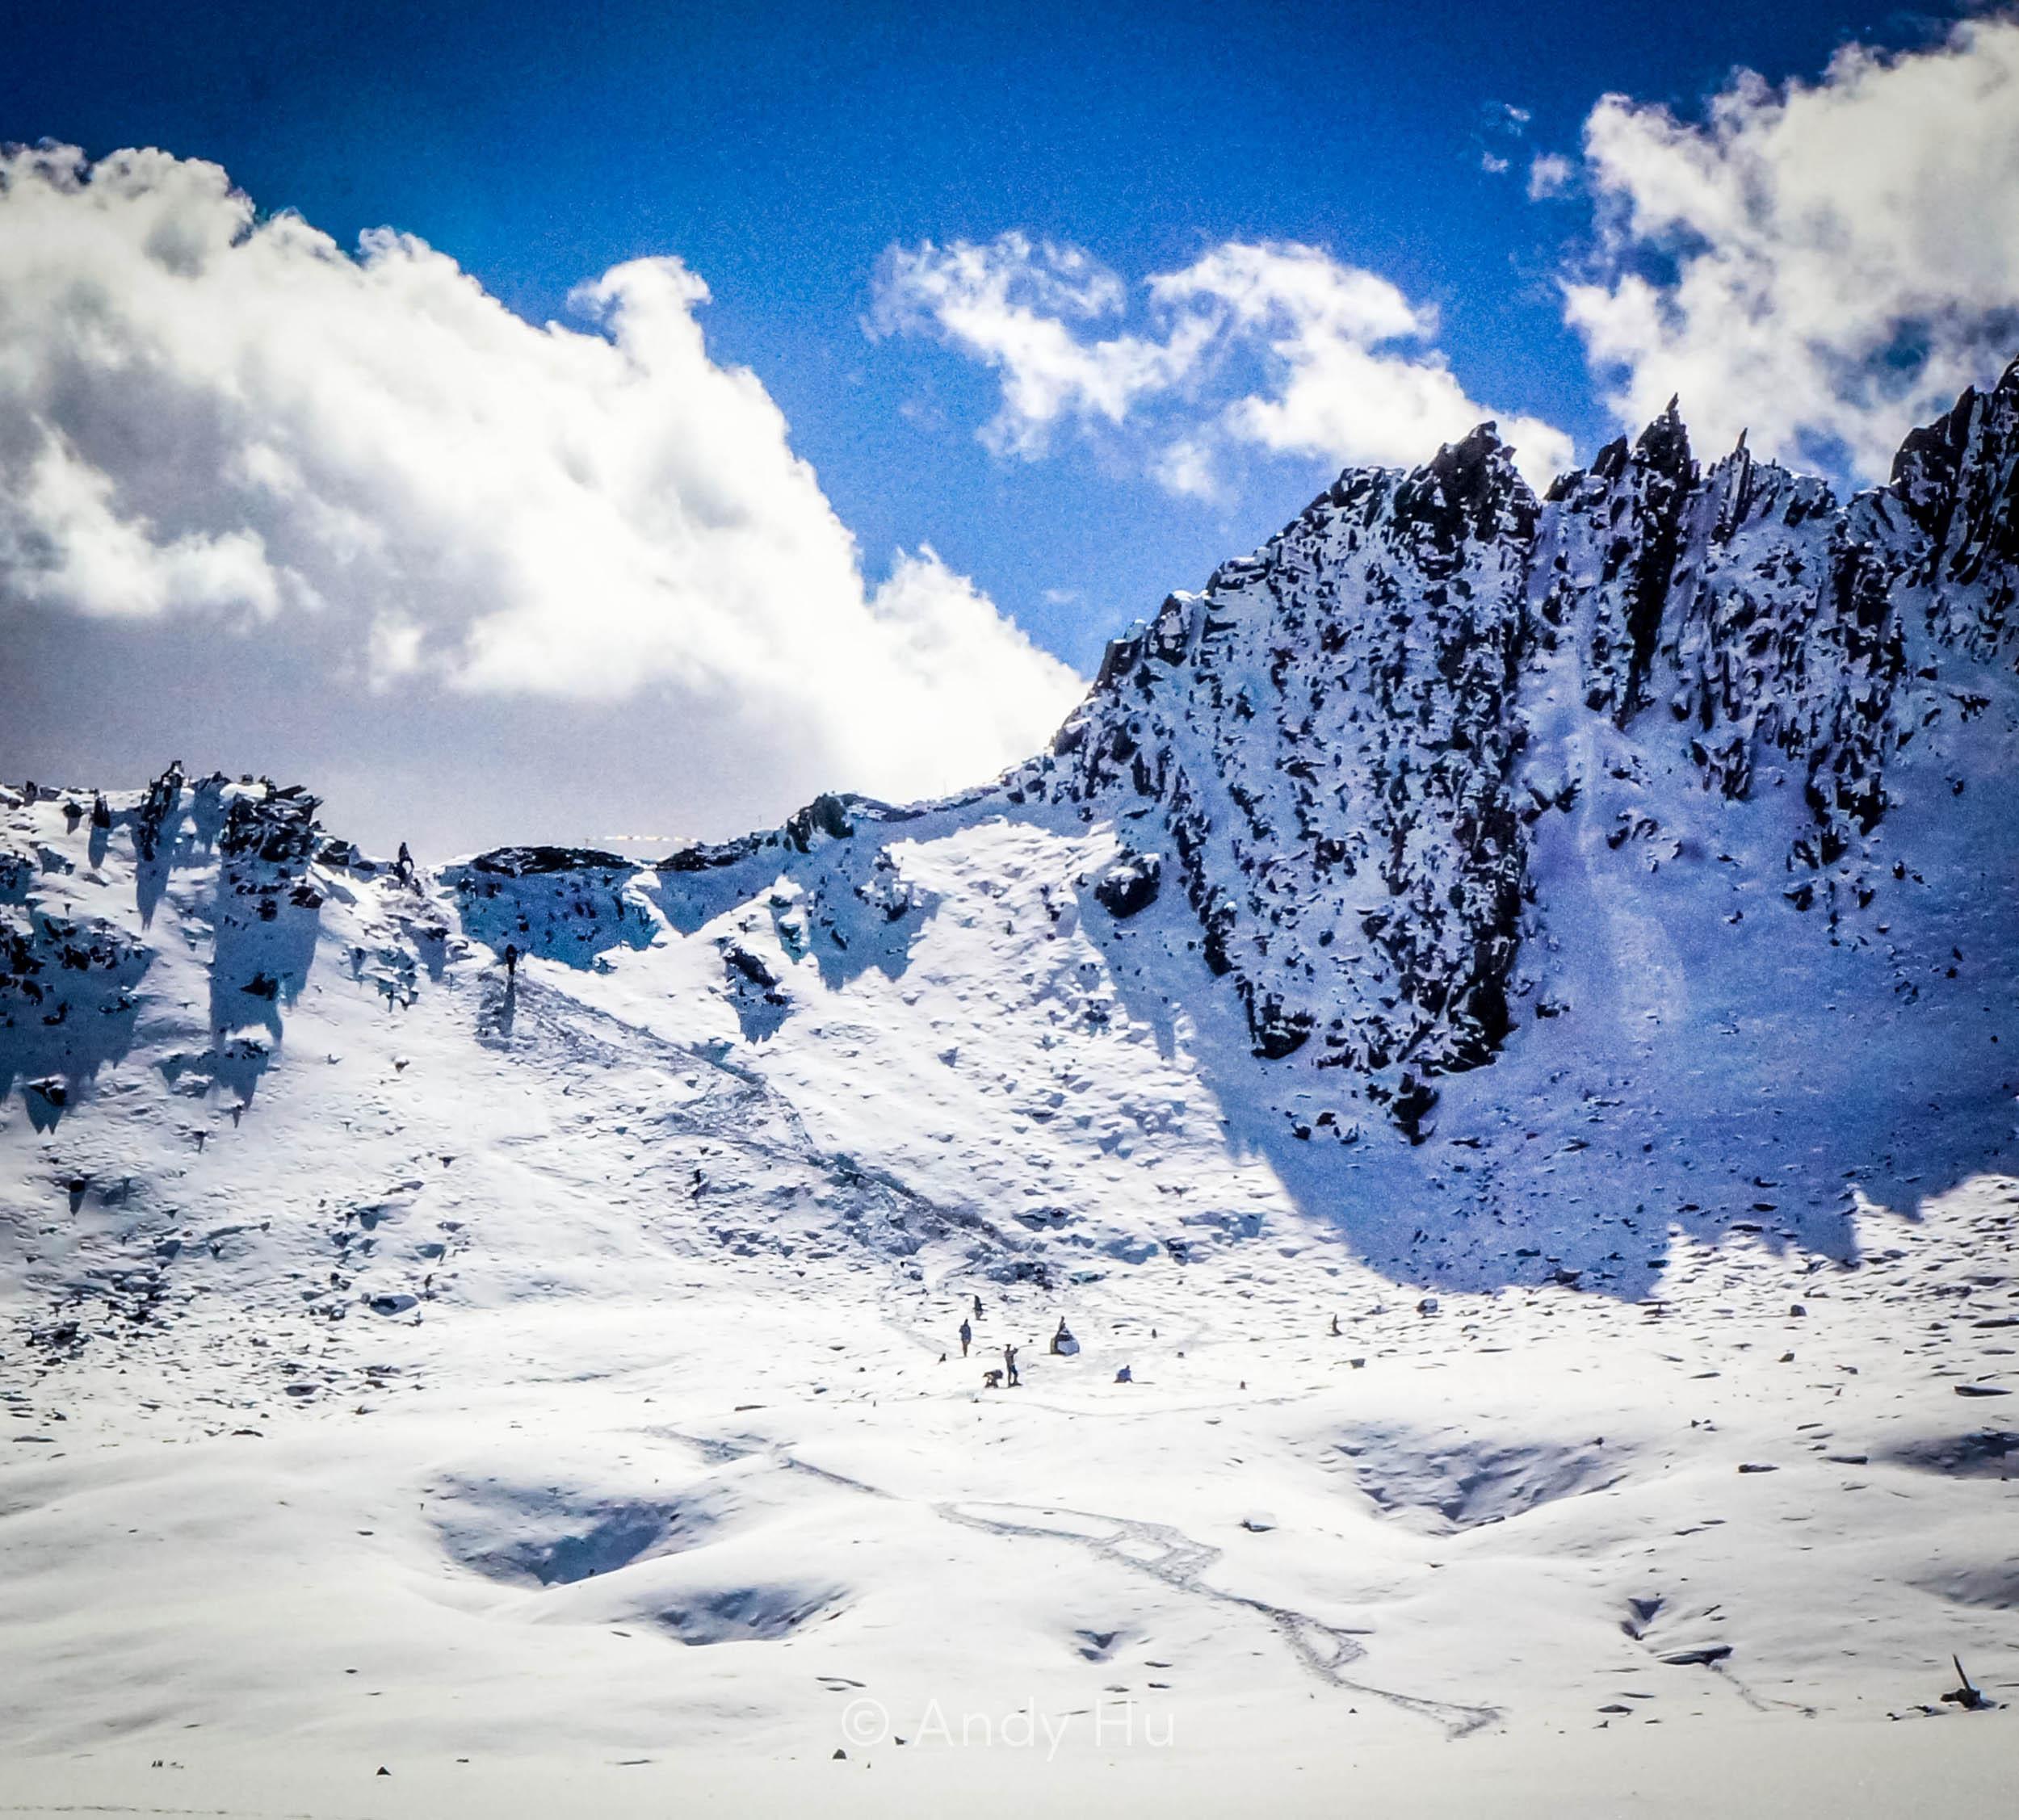 Riwoche Pass, day 2 Mt. Gongga Trek